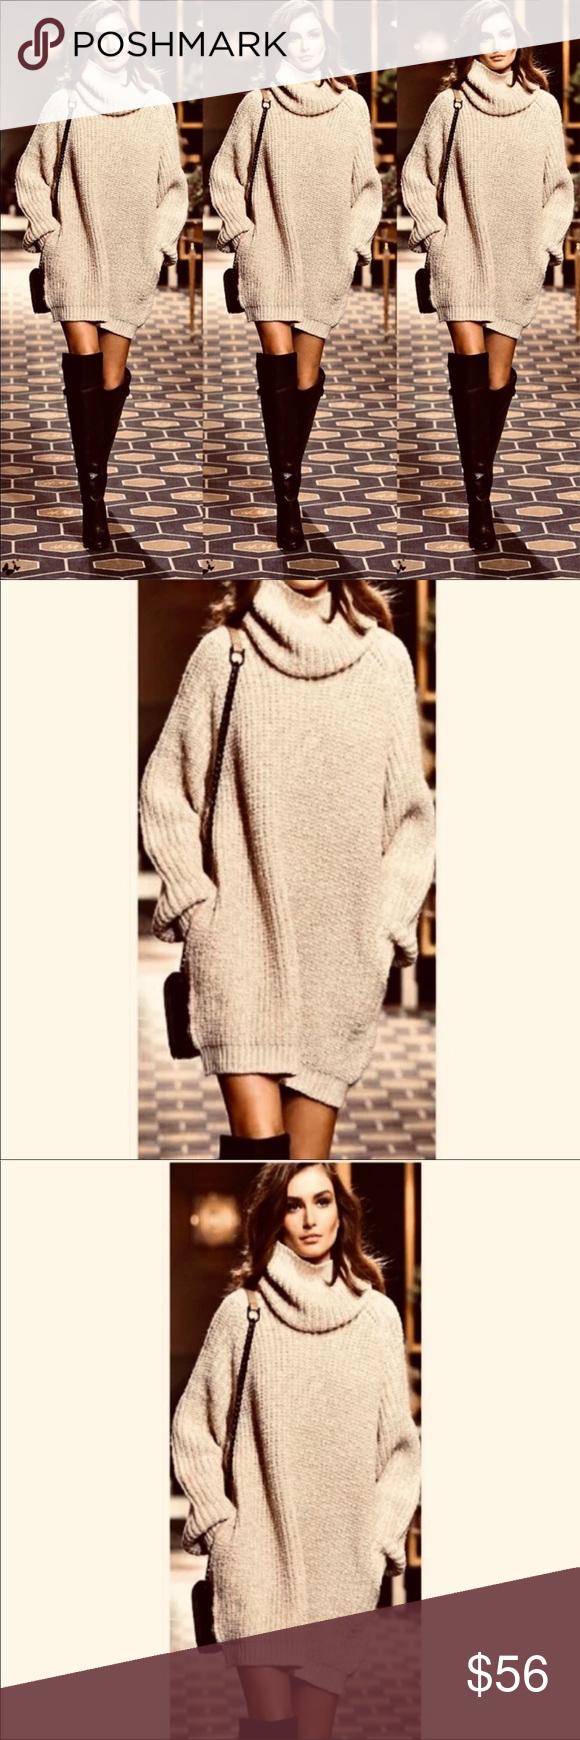 c46b2c1b101 ✨COZY & SEXY TURTLENECK SWEATER/ SWEATER DRESS-TAN Boutique